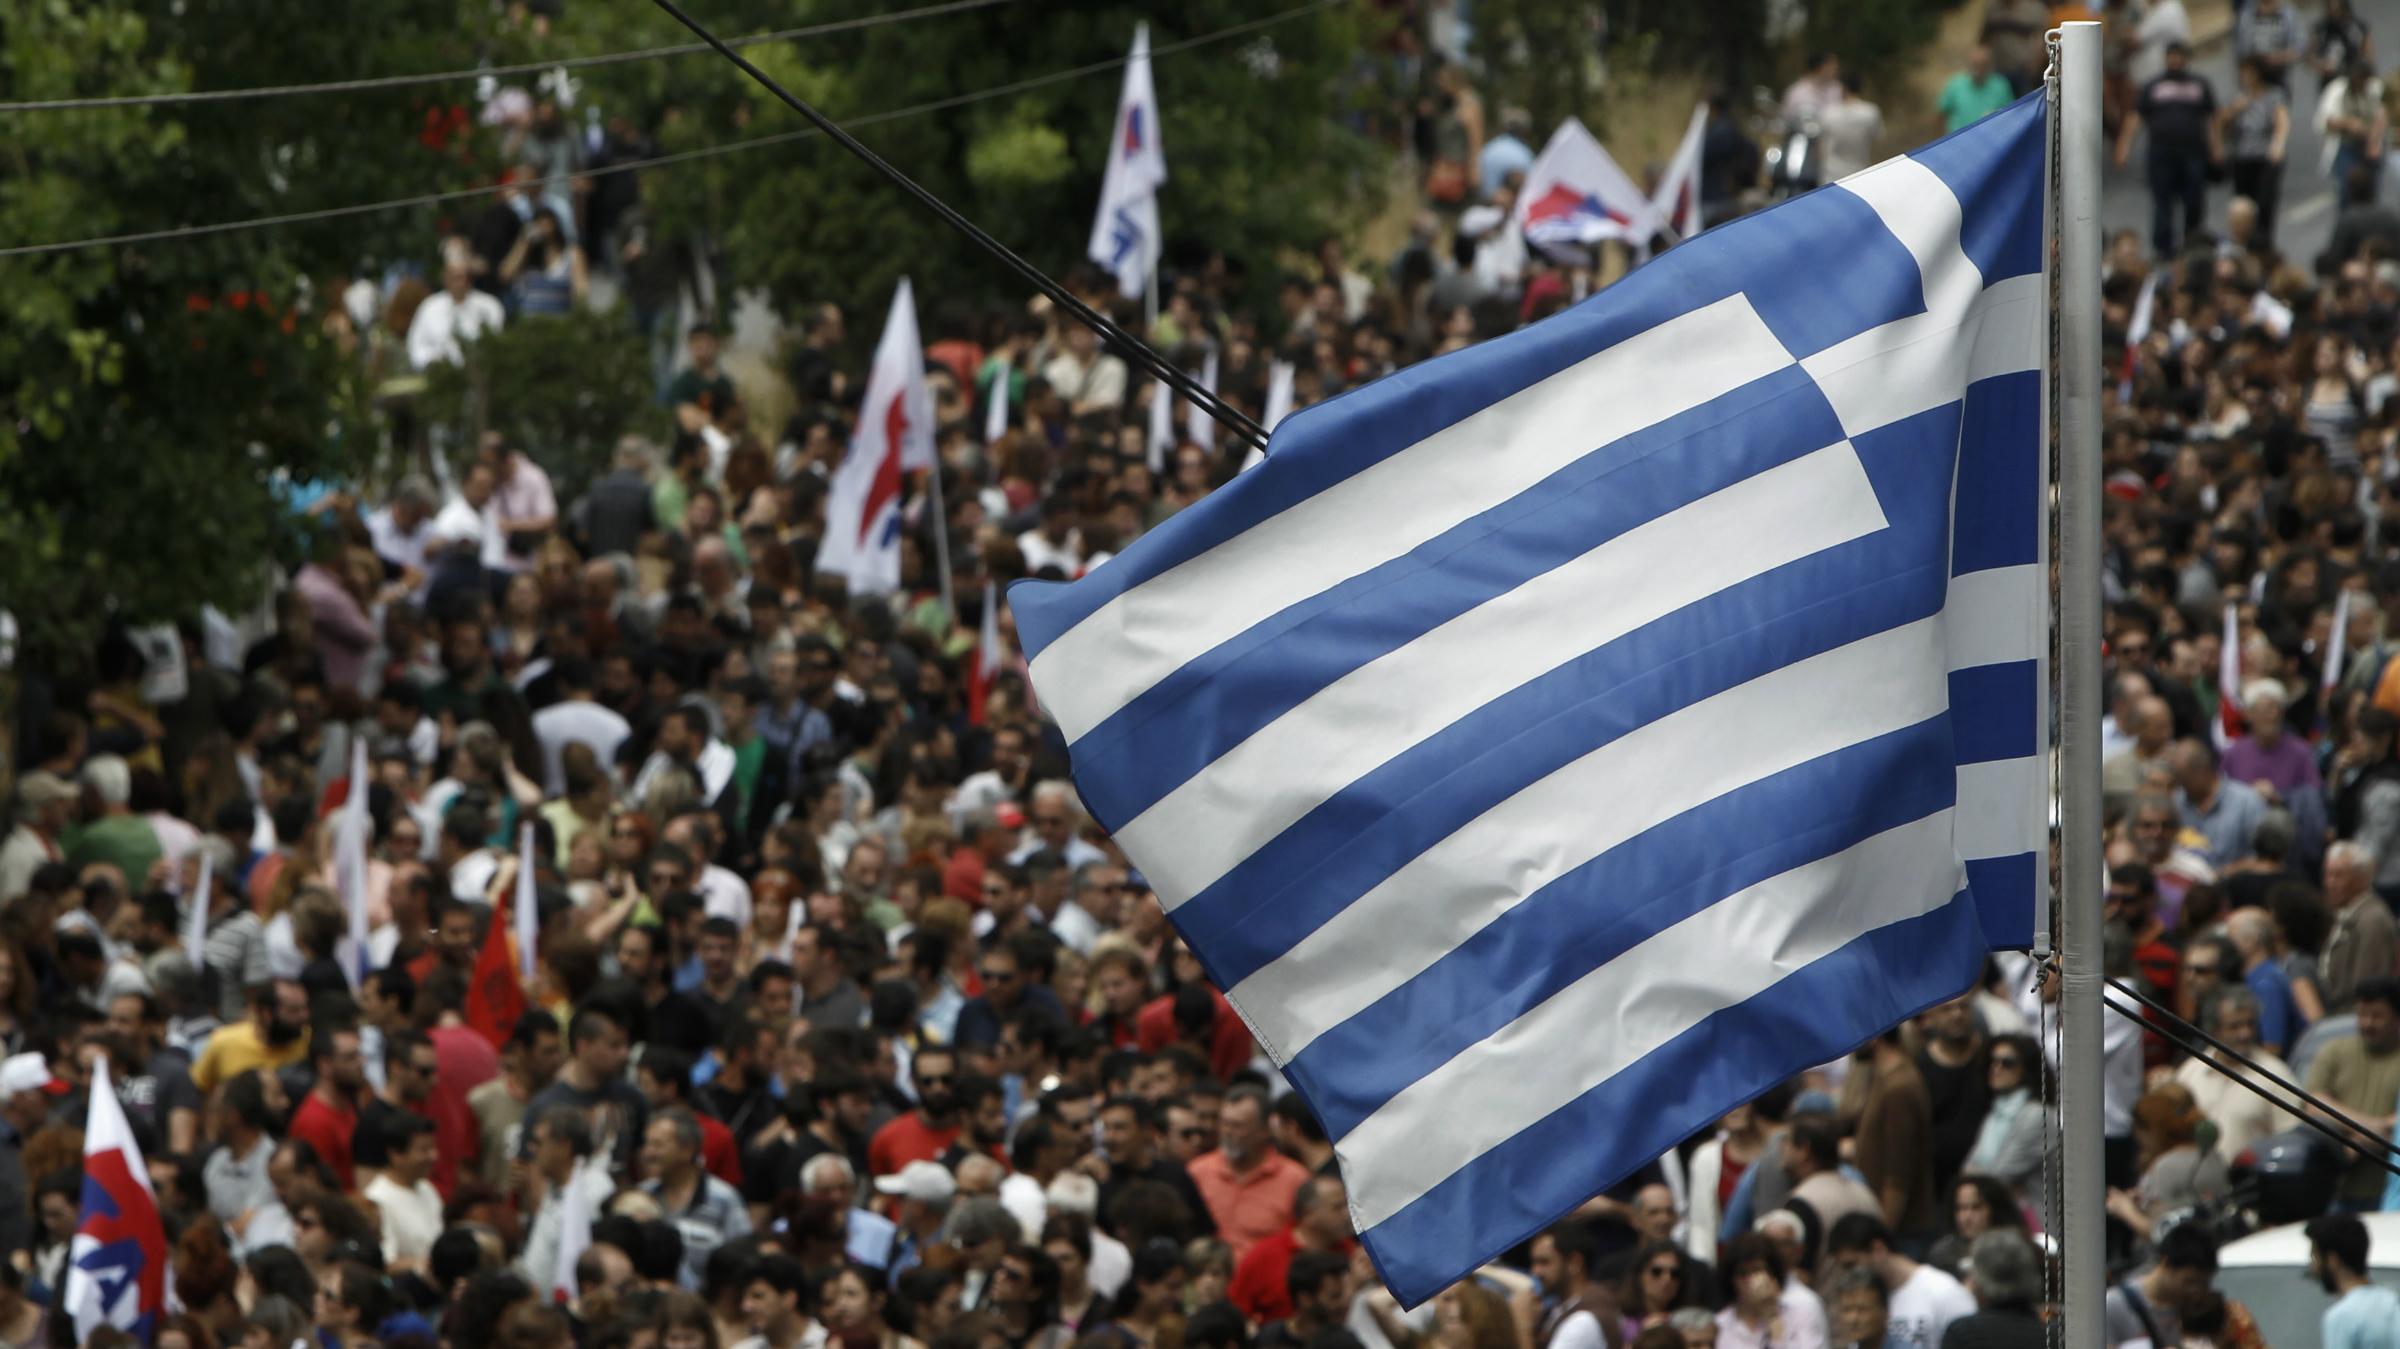 greece political unrest flag protest